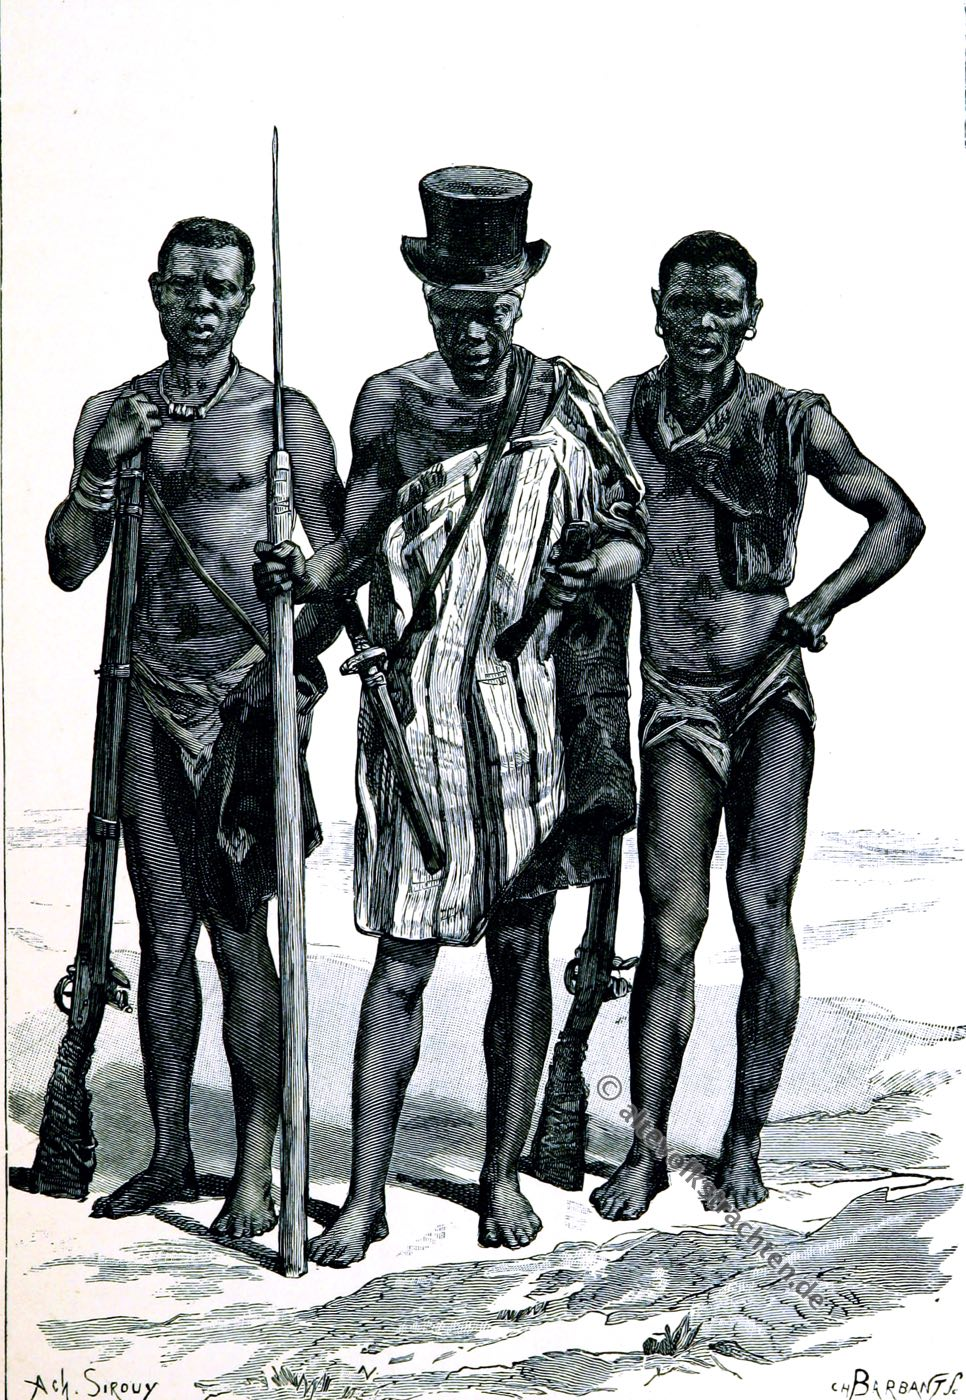 Felup, Fulup, Afrika, Senegambia, Trachten, Kostüme, Élisée Reclus